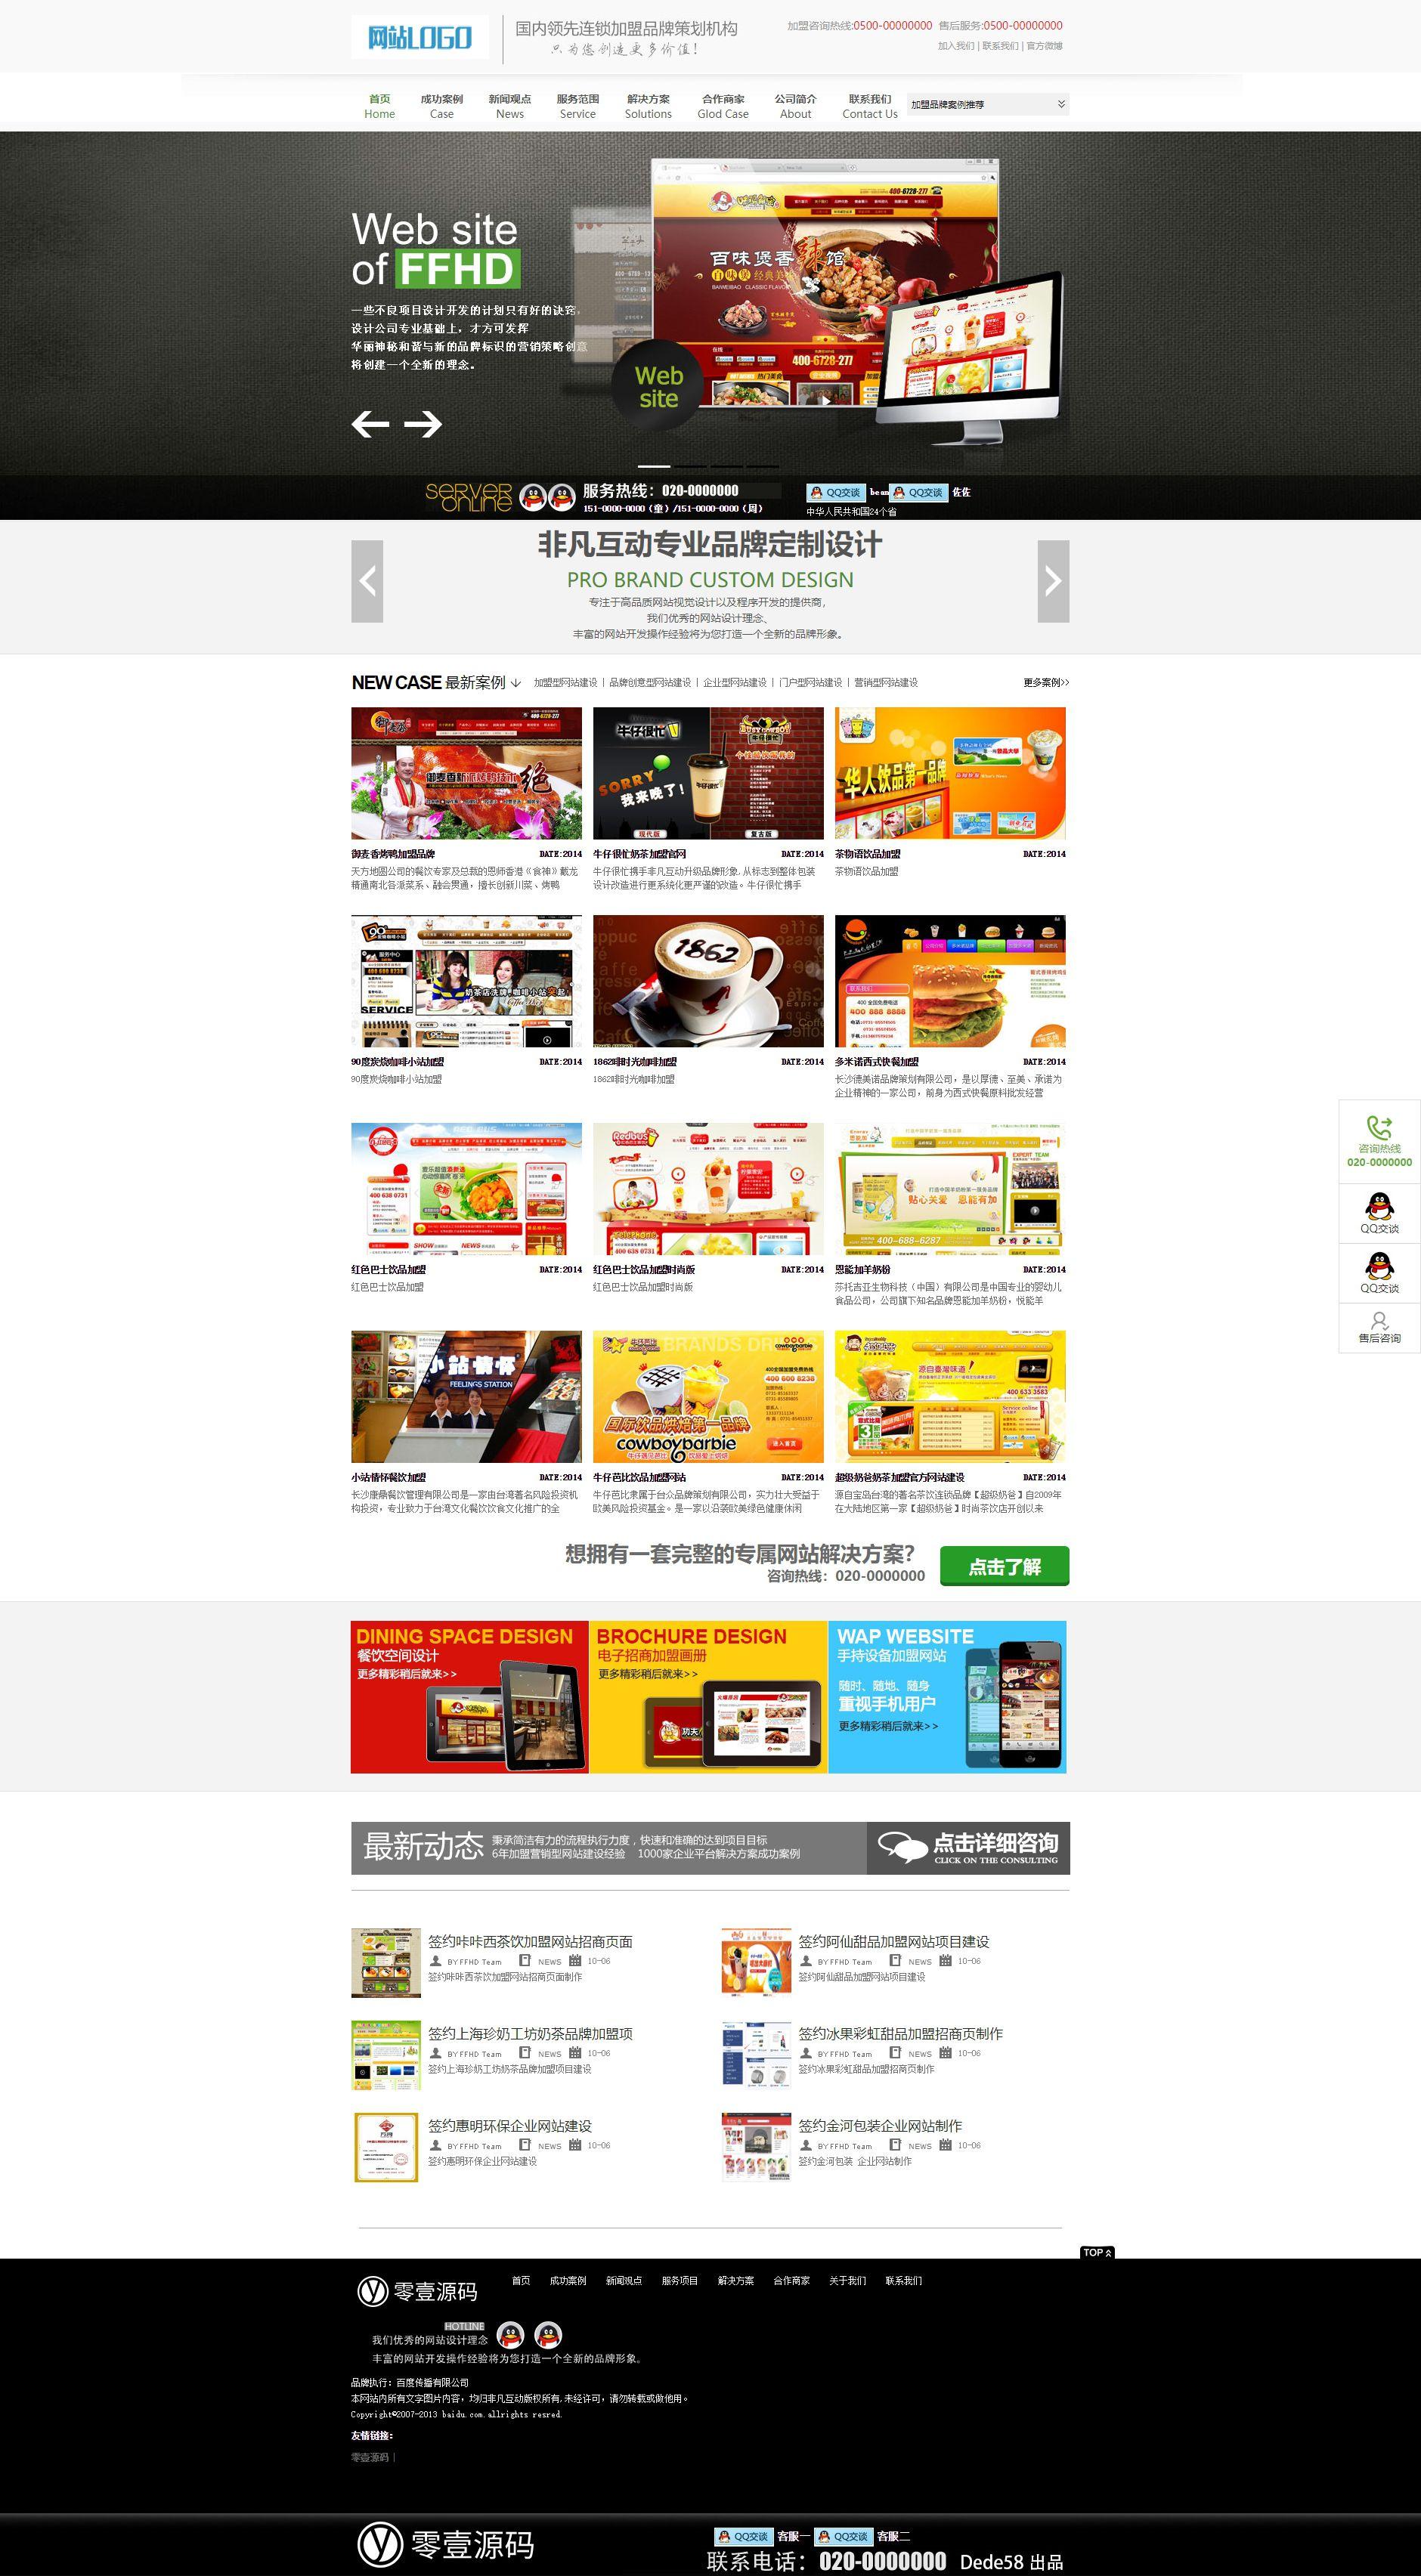 Html5高端网络广告策划公司织梦dedecms模板